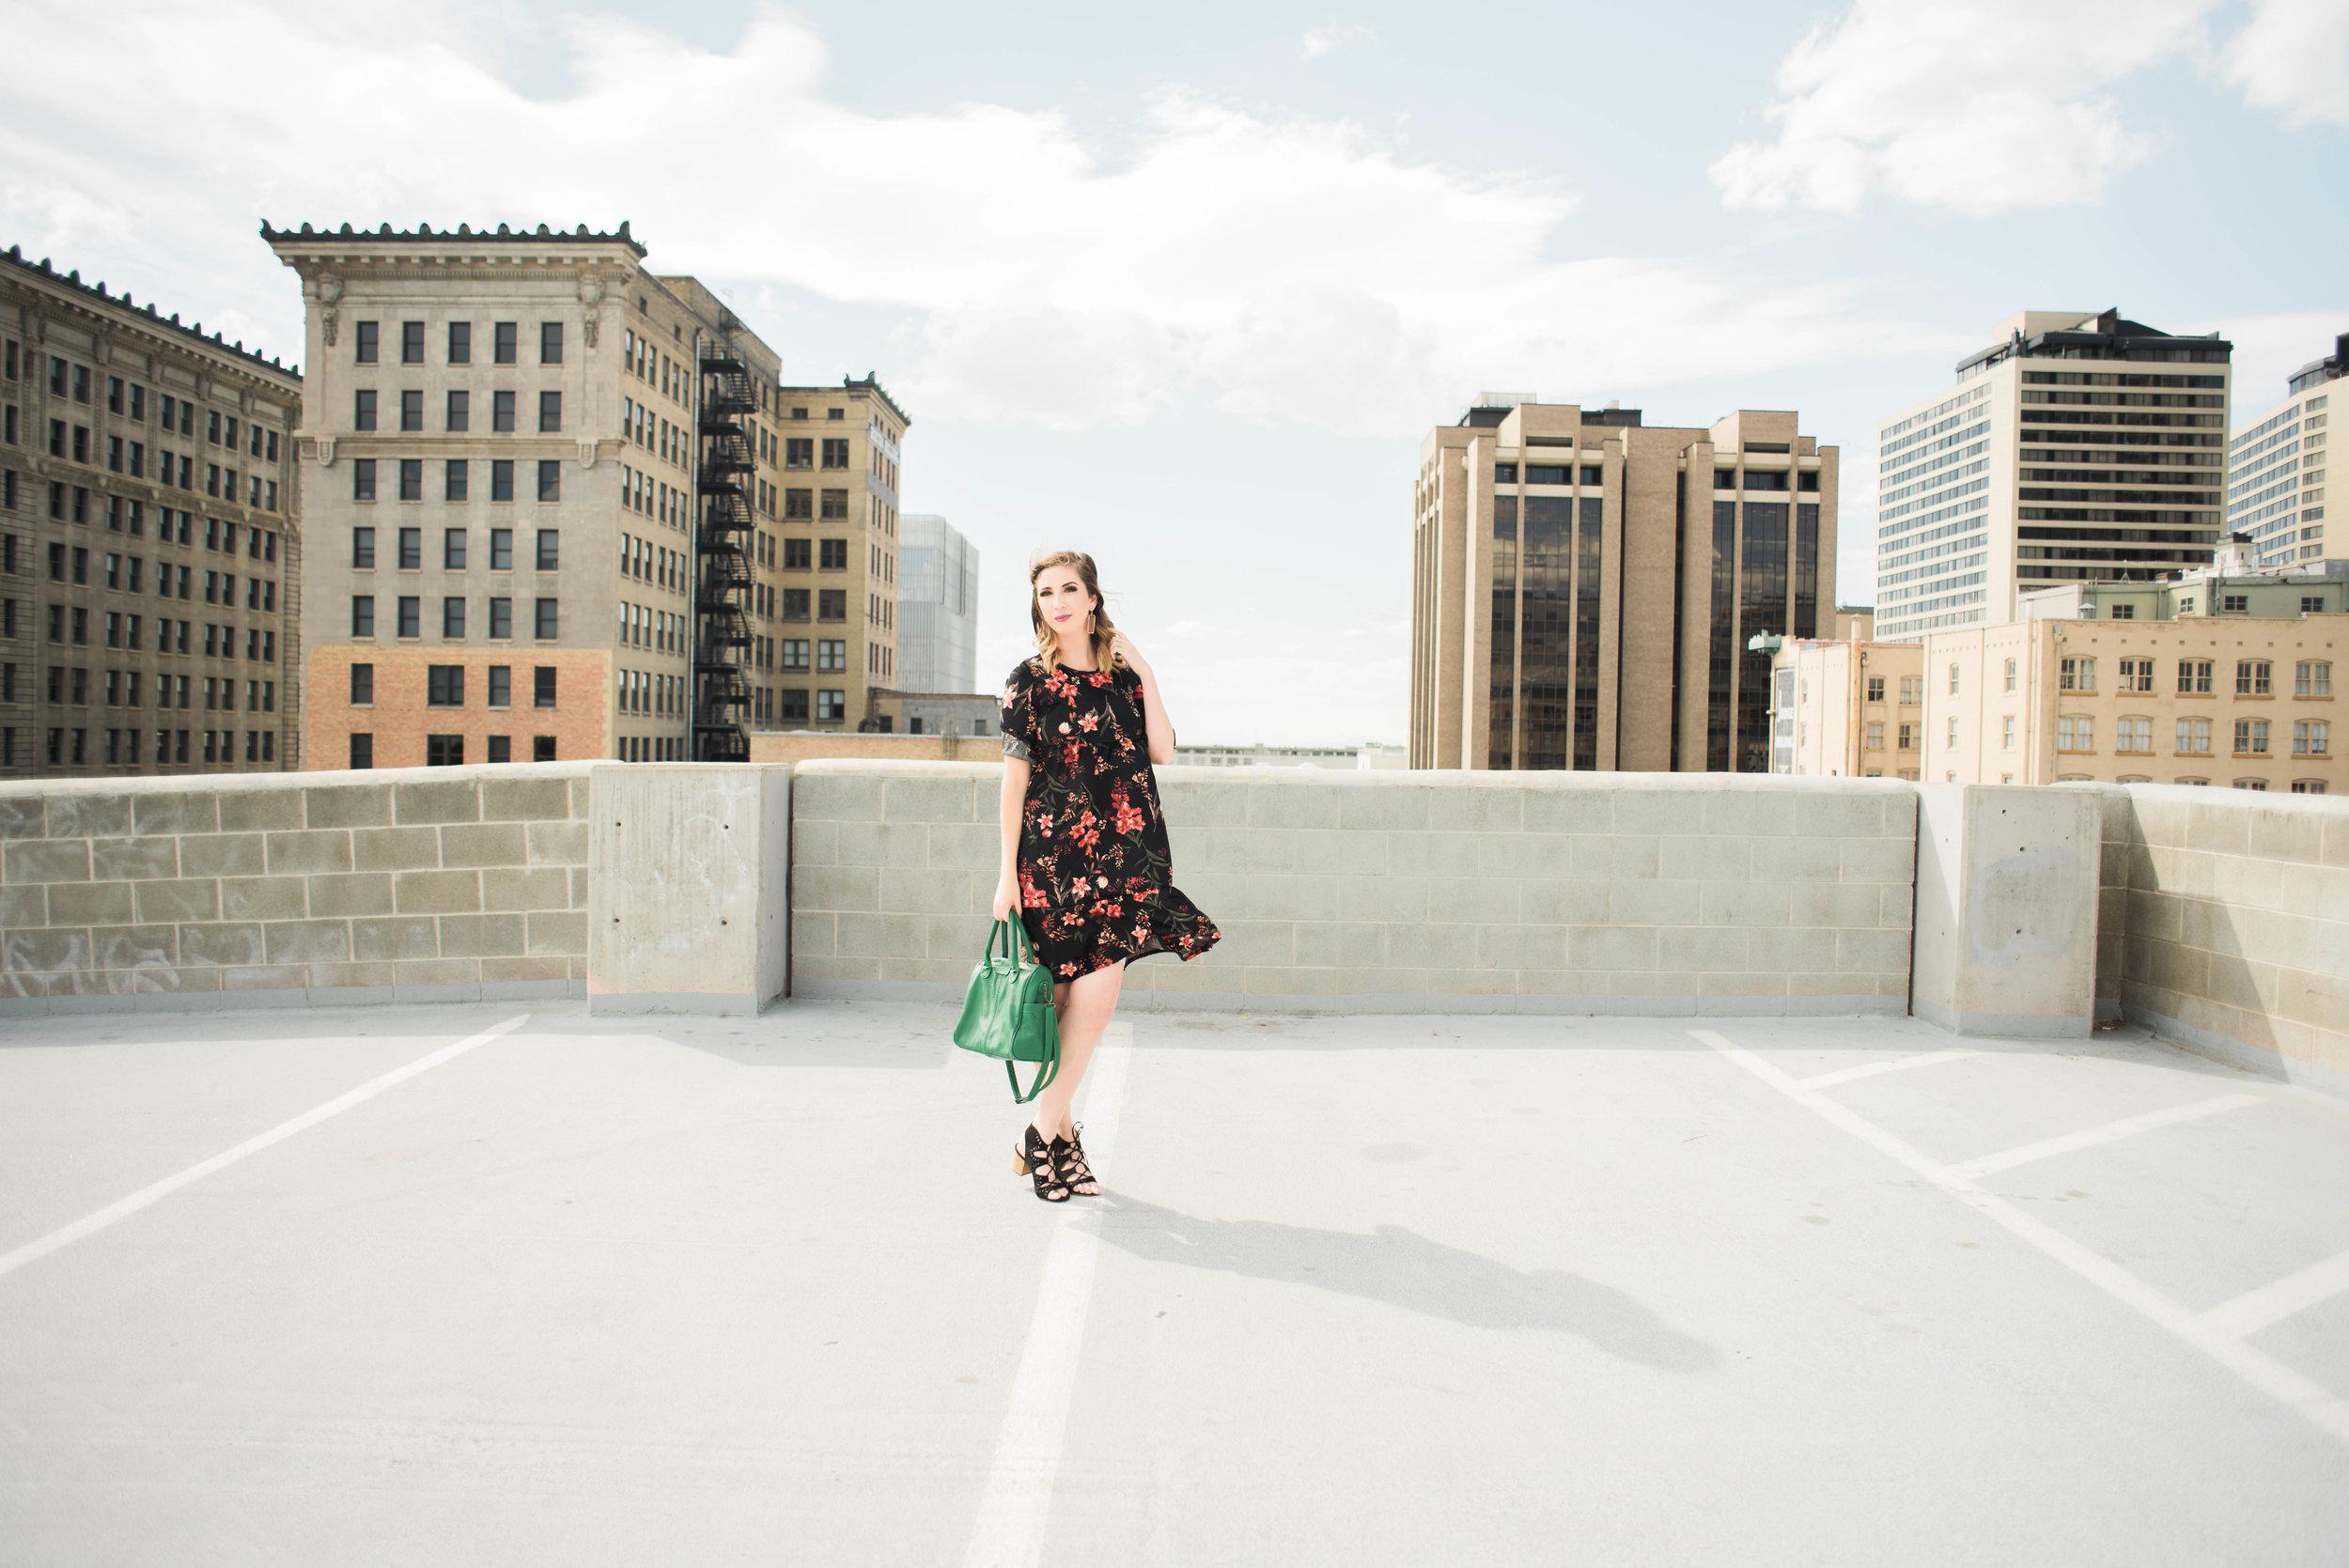 HEY-THERE-CHELSIE-Sadie_Banks_Photography-16.jpg